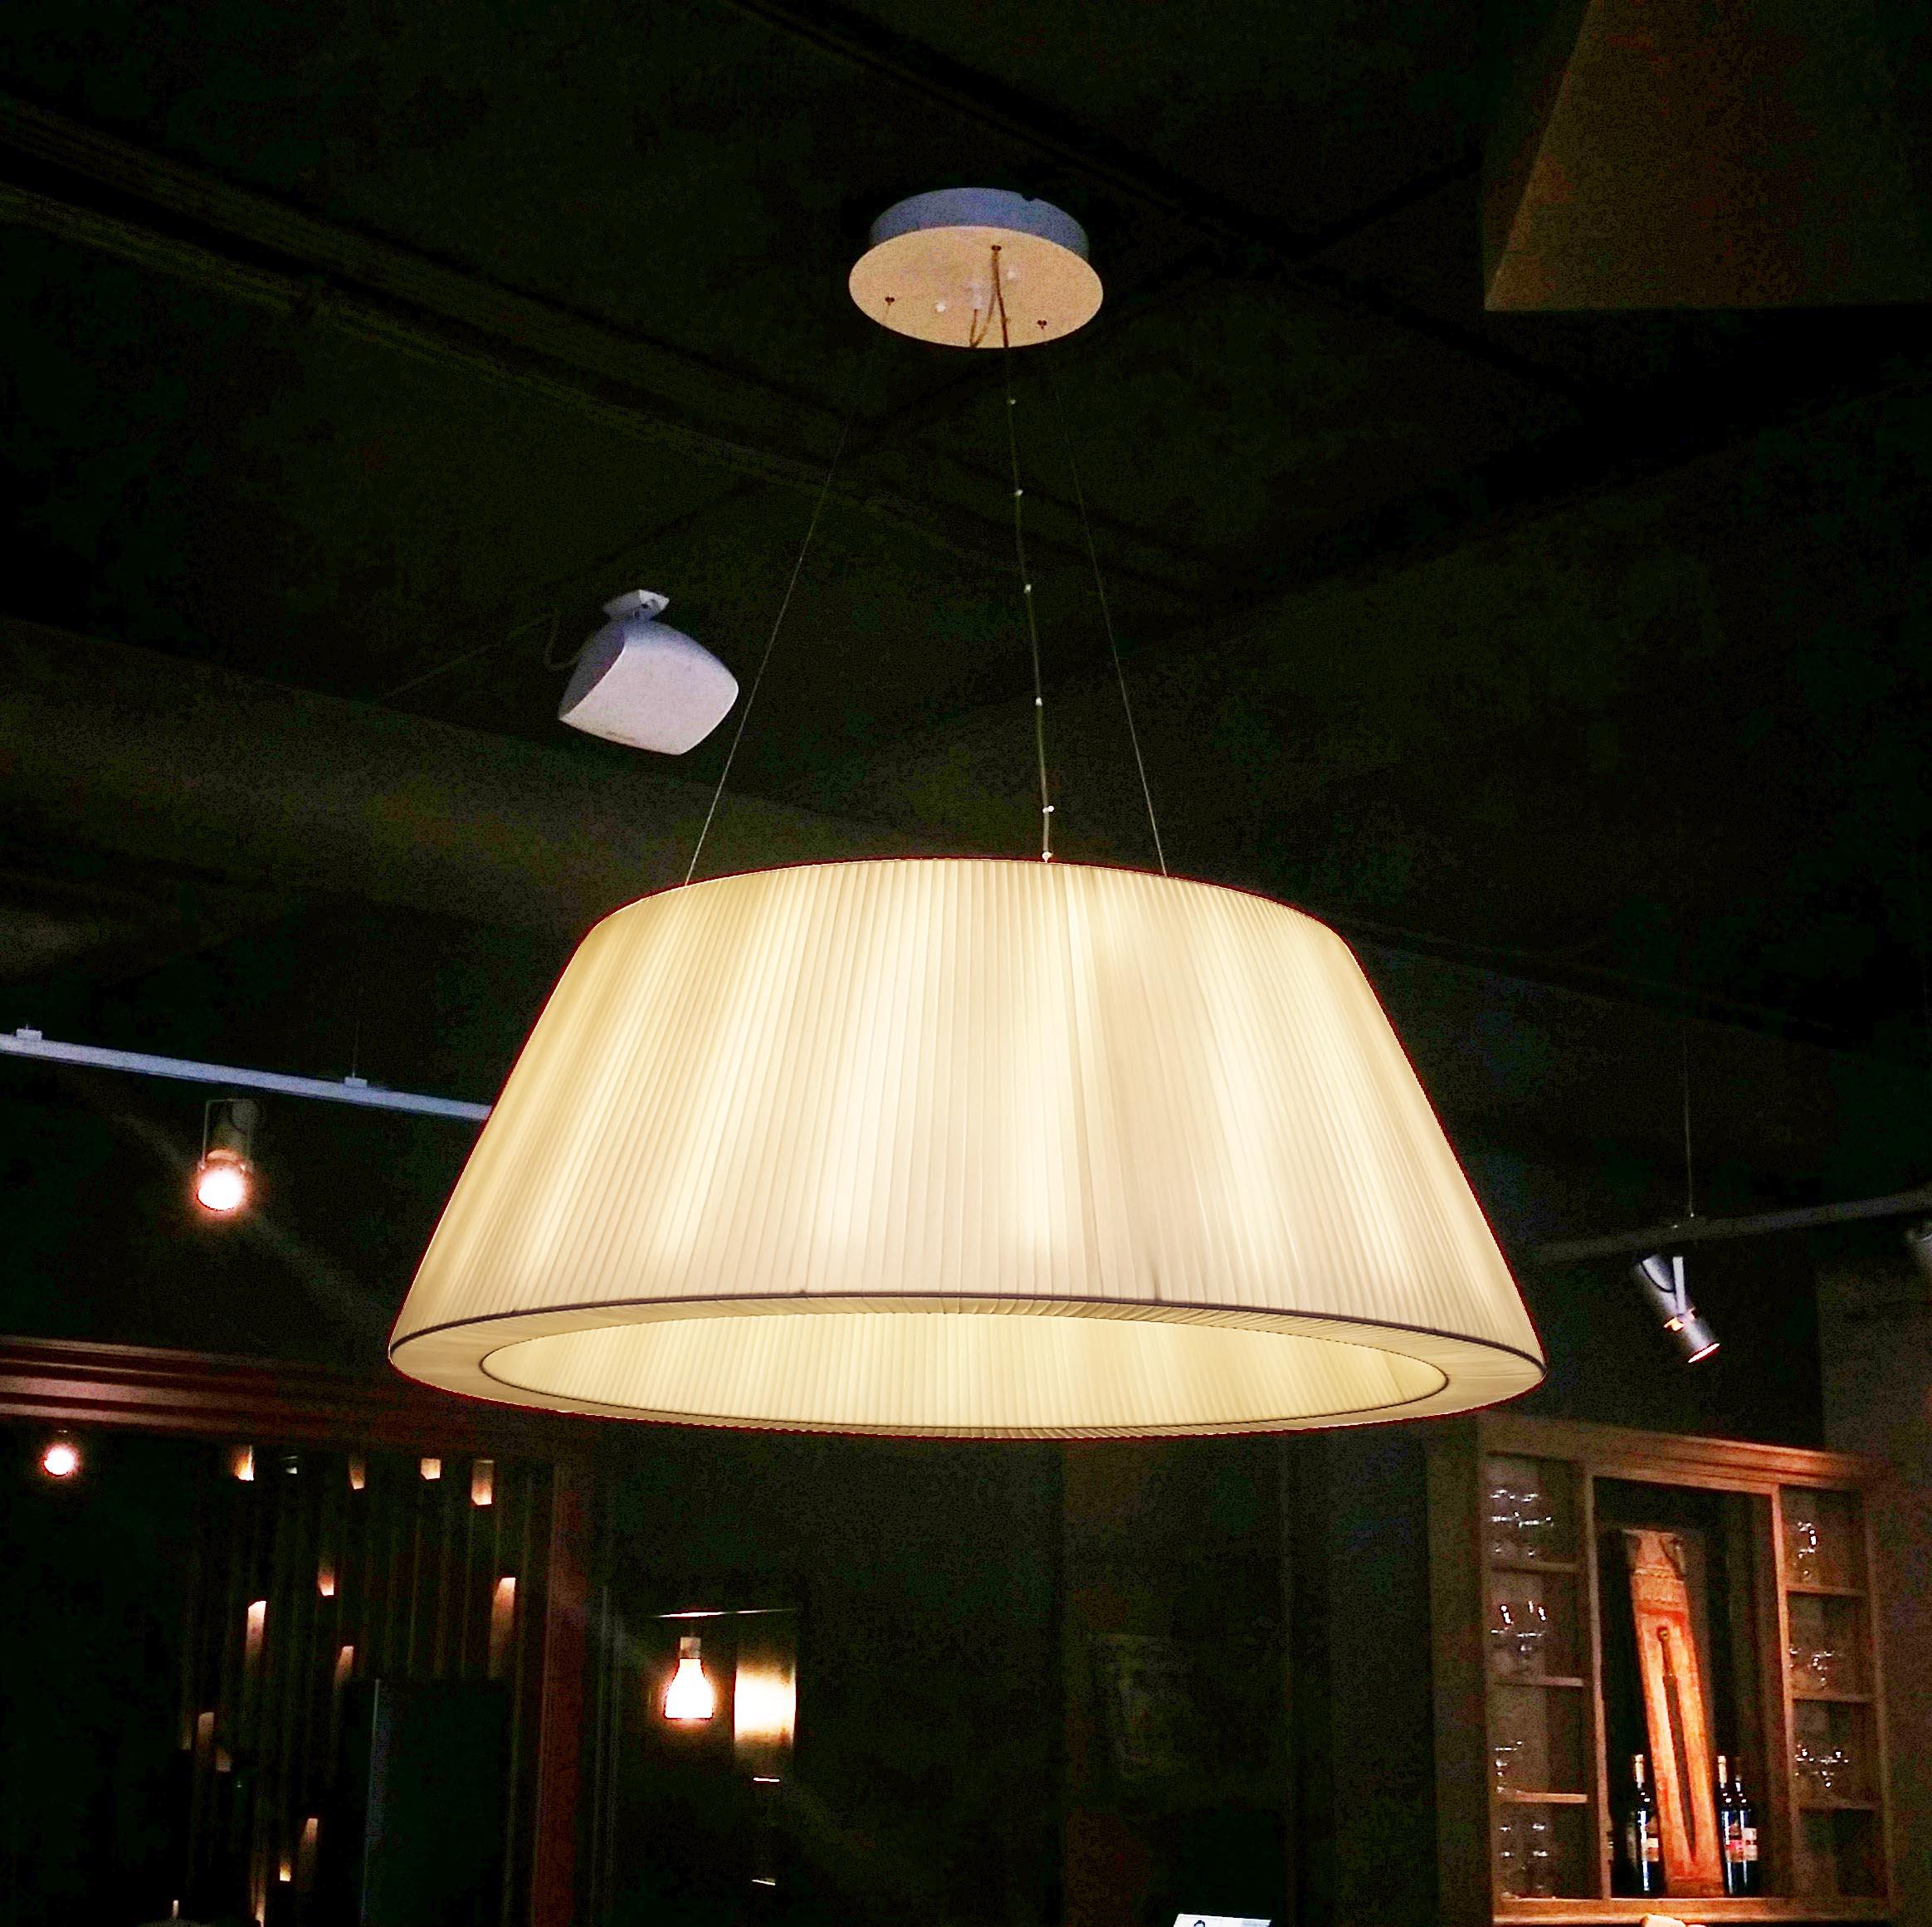 Abajur svetodiodniy 130 cm